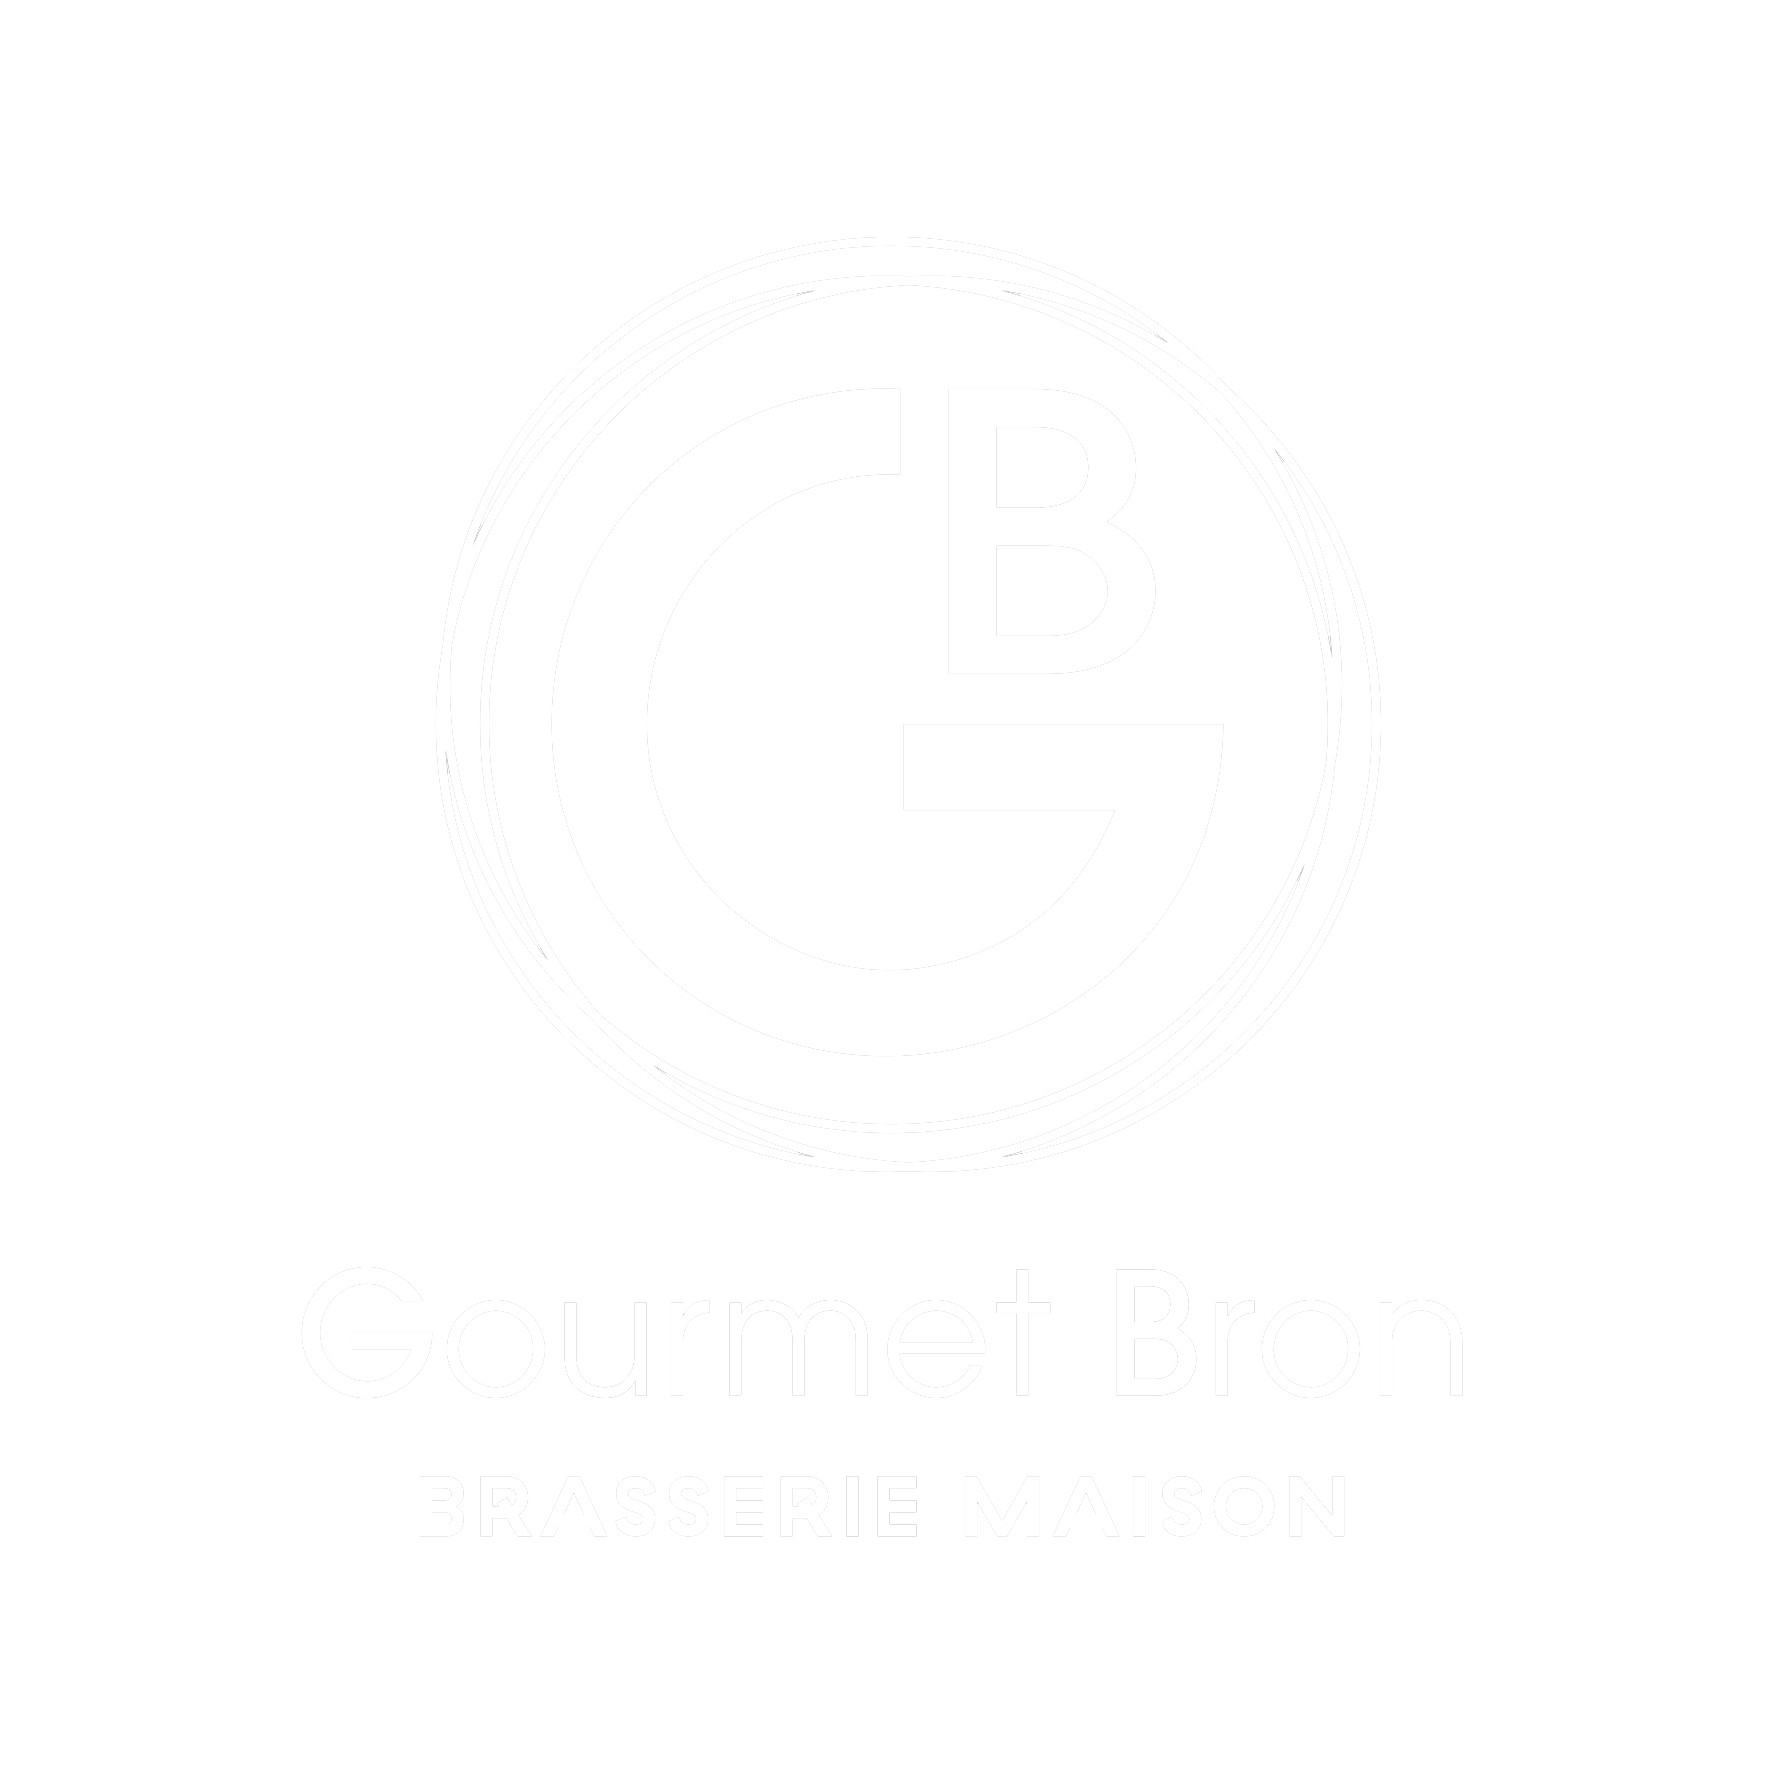 Logo Gourmet Bron - Brasserie Maison